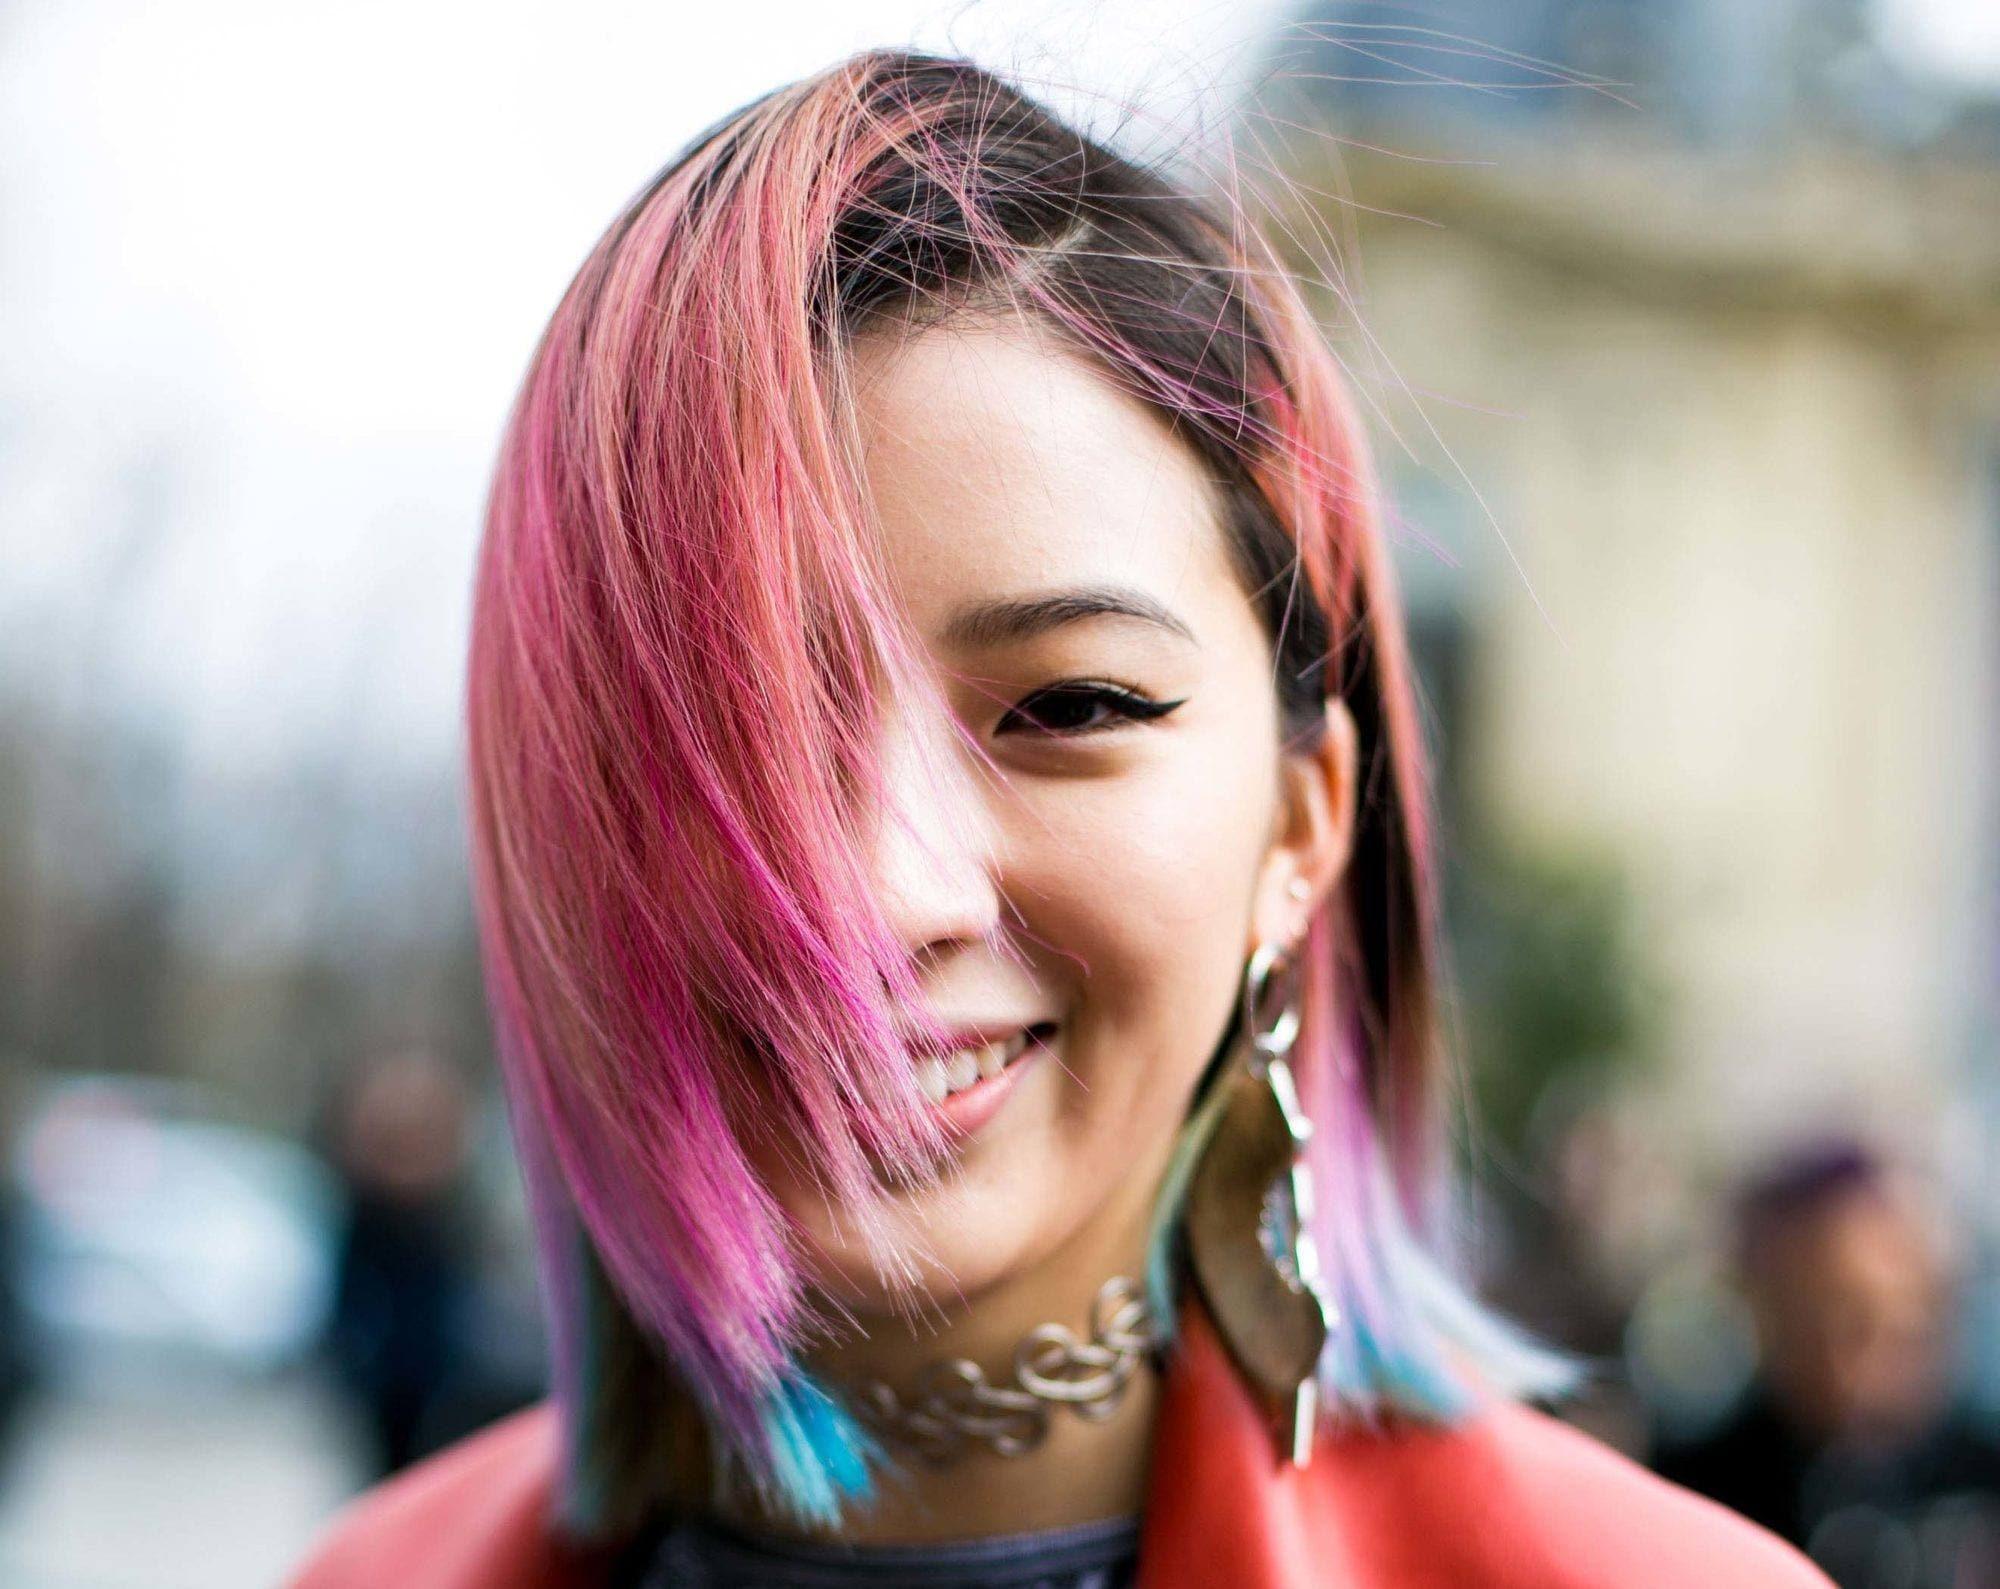 DIY hair color - multiple colors